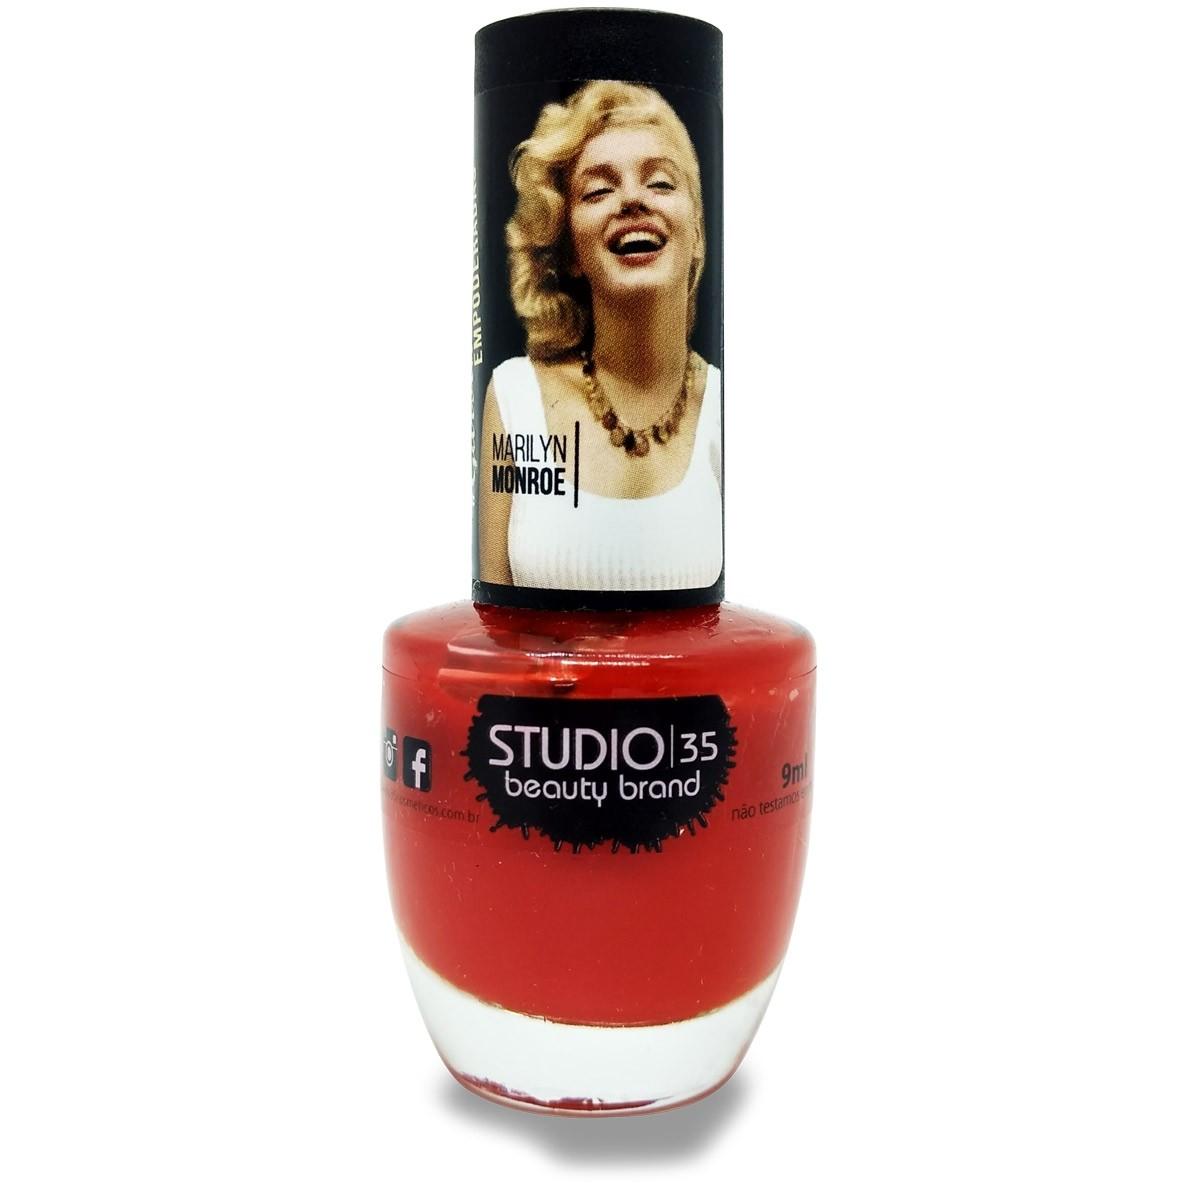 Esmalte Studio 35 #CarpeDiem Coleção Marilyn Monroe